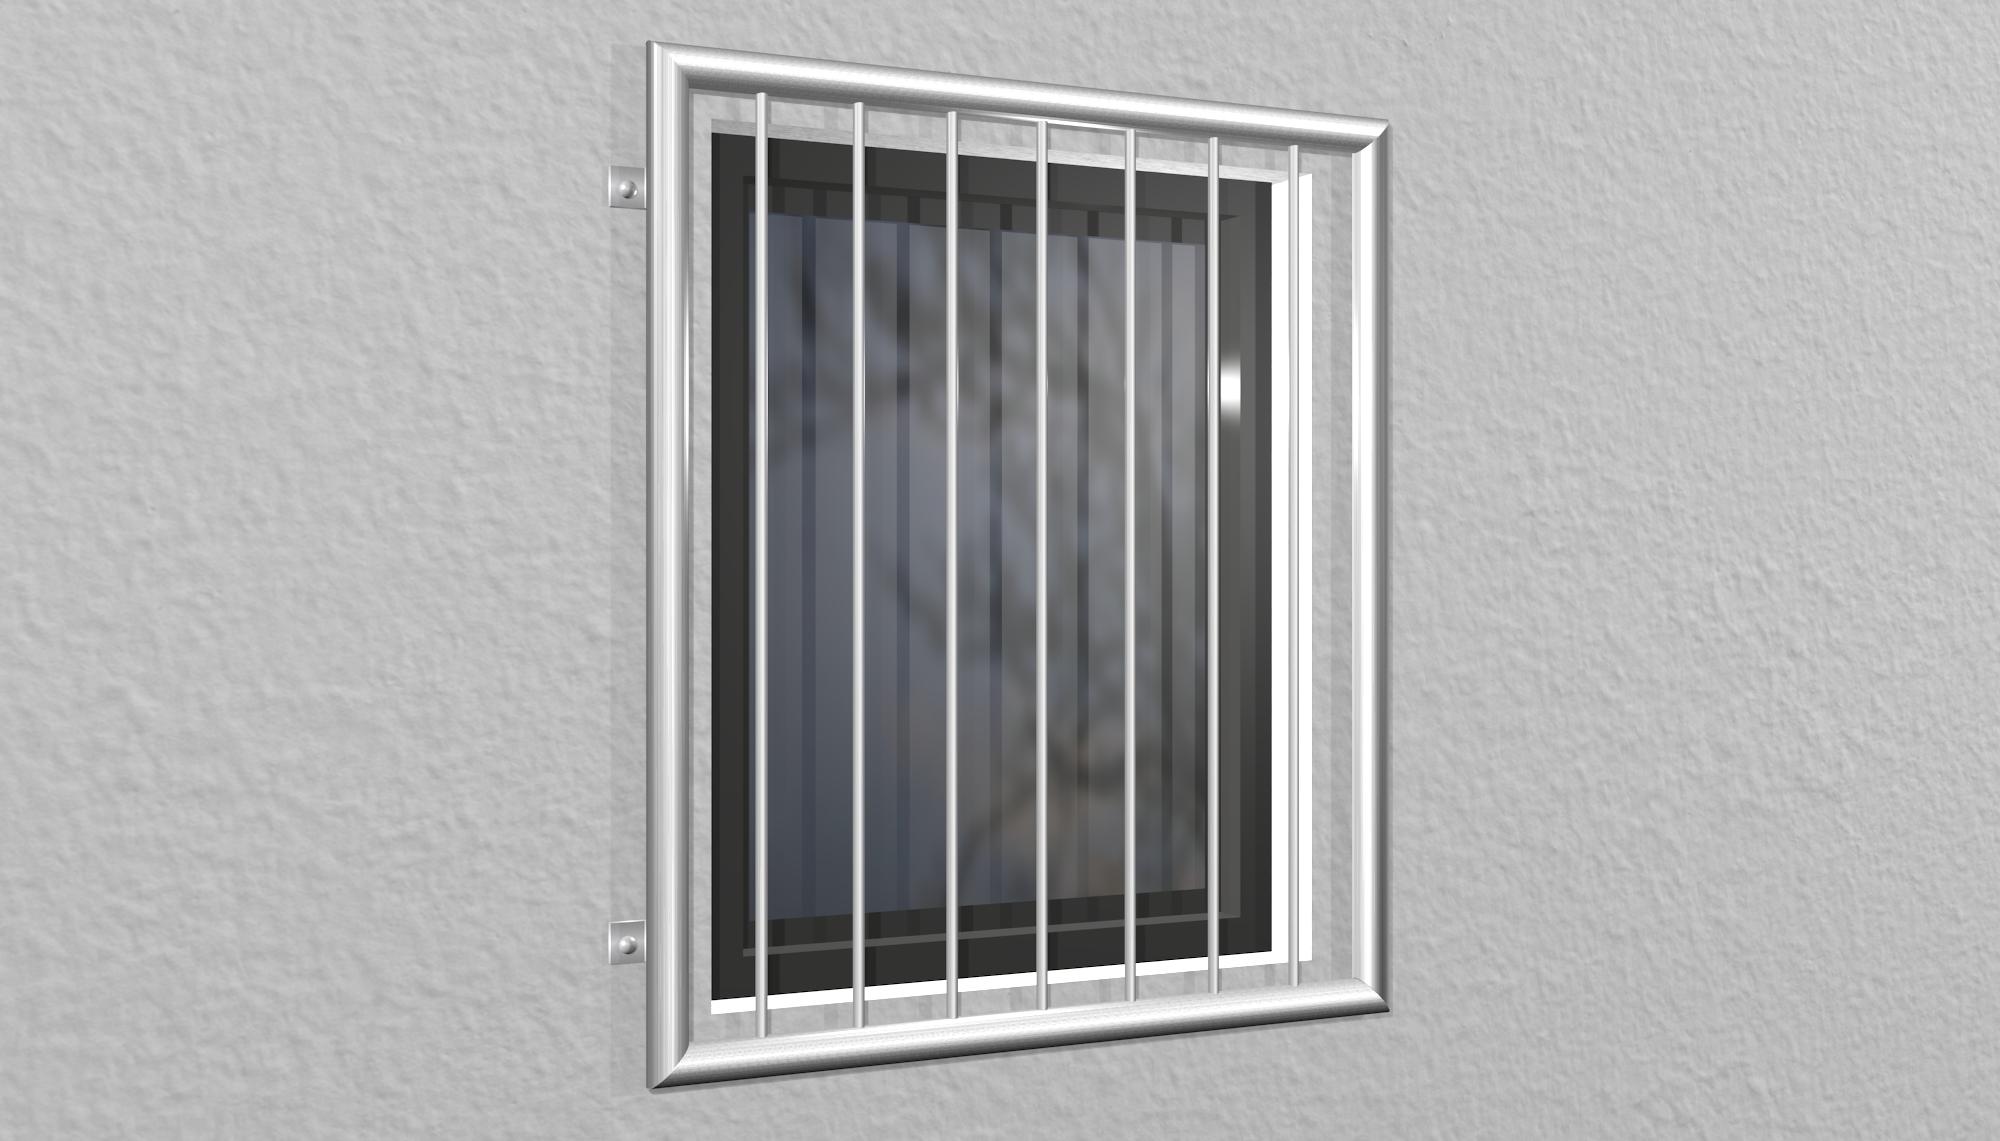 Fenstergitter Edelstahl Vertikalstab 1